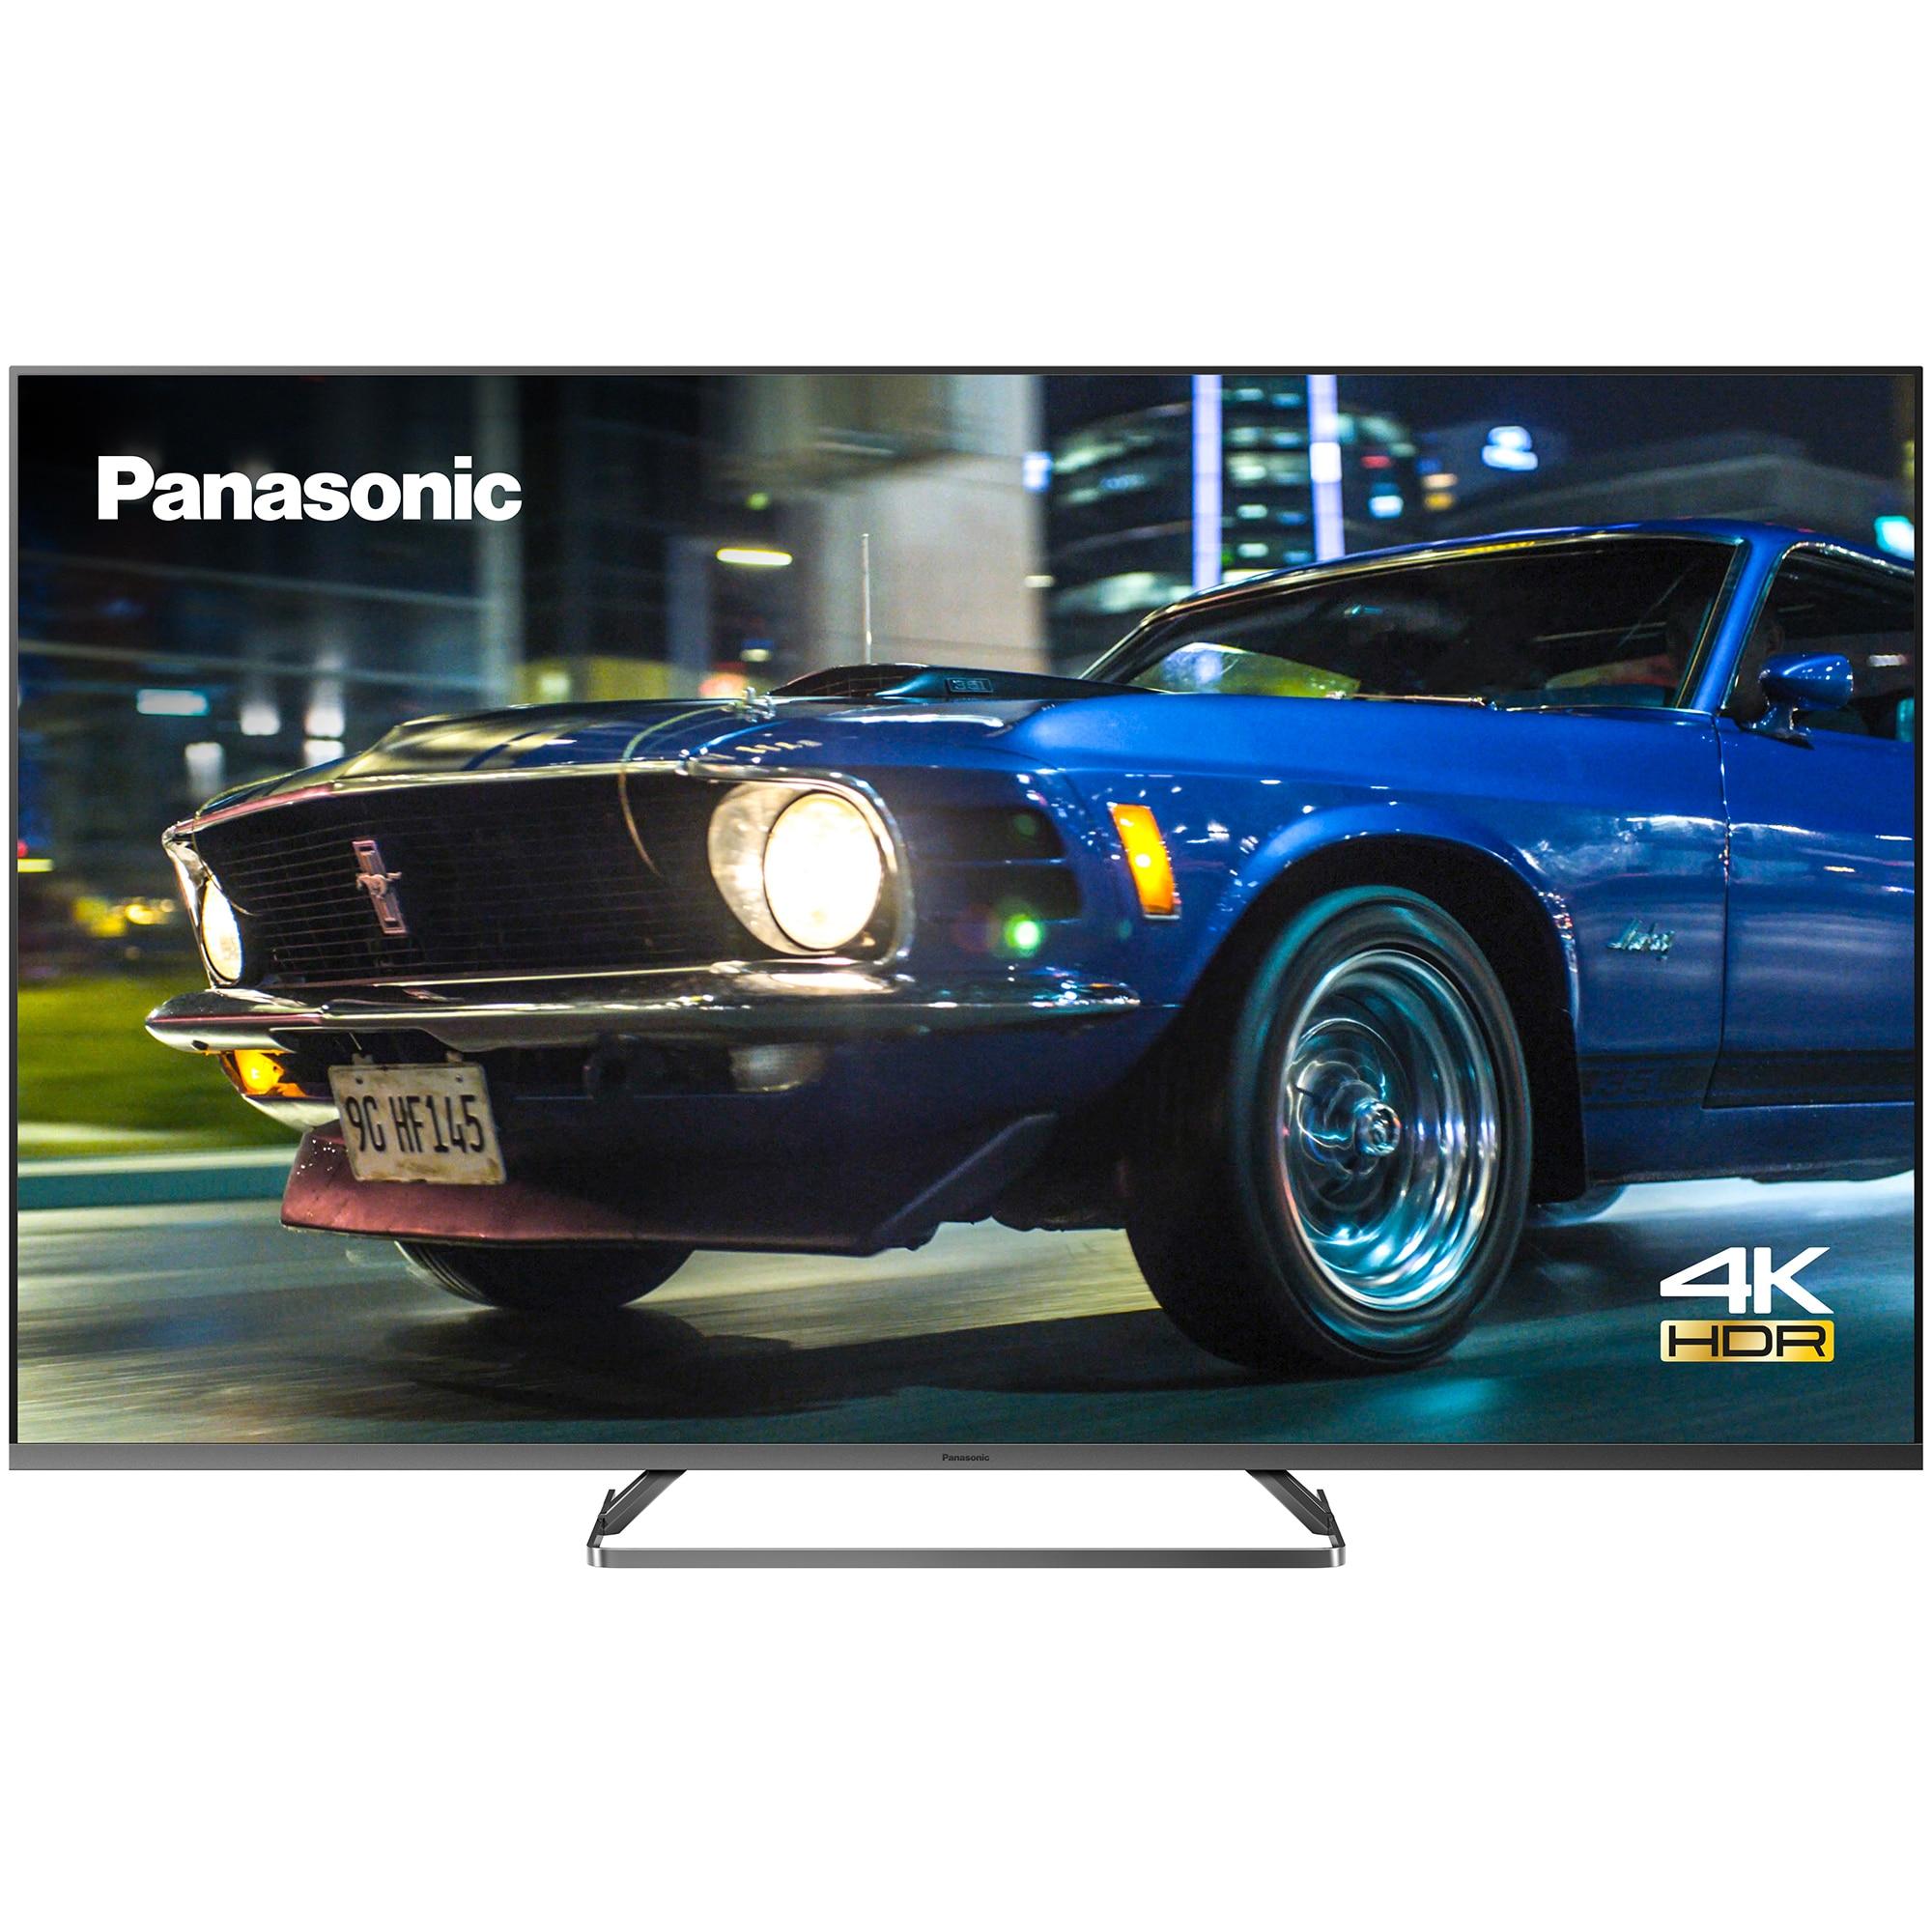 Fotografie Televizor Panasonic TX-50HX810E, 126 cm, Smart, 4K Ultra HD, LED, Clasa A+